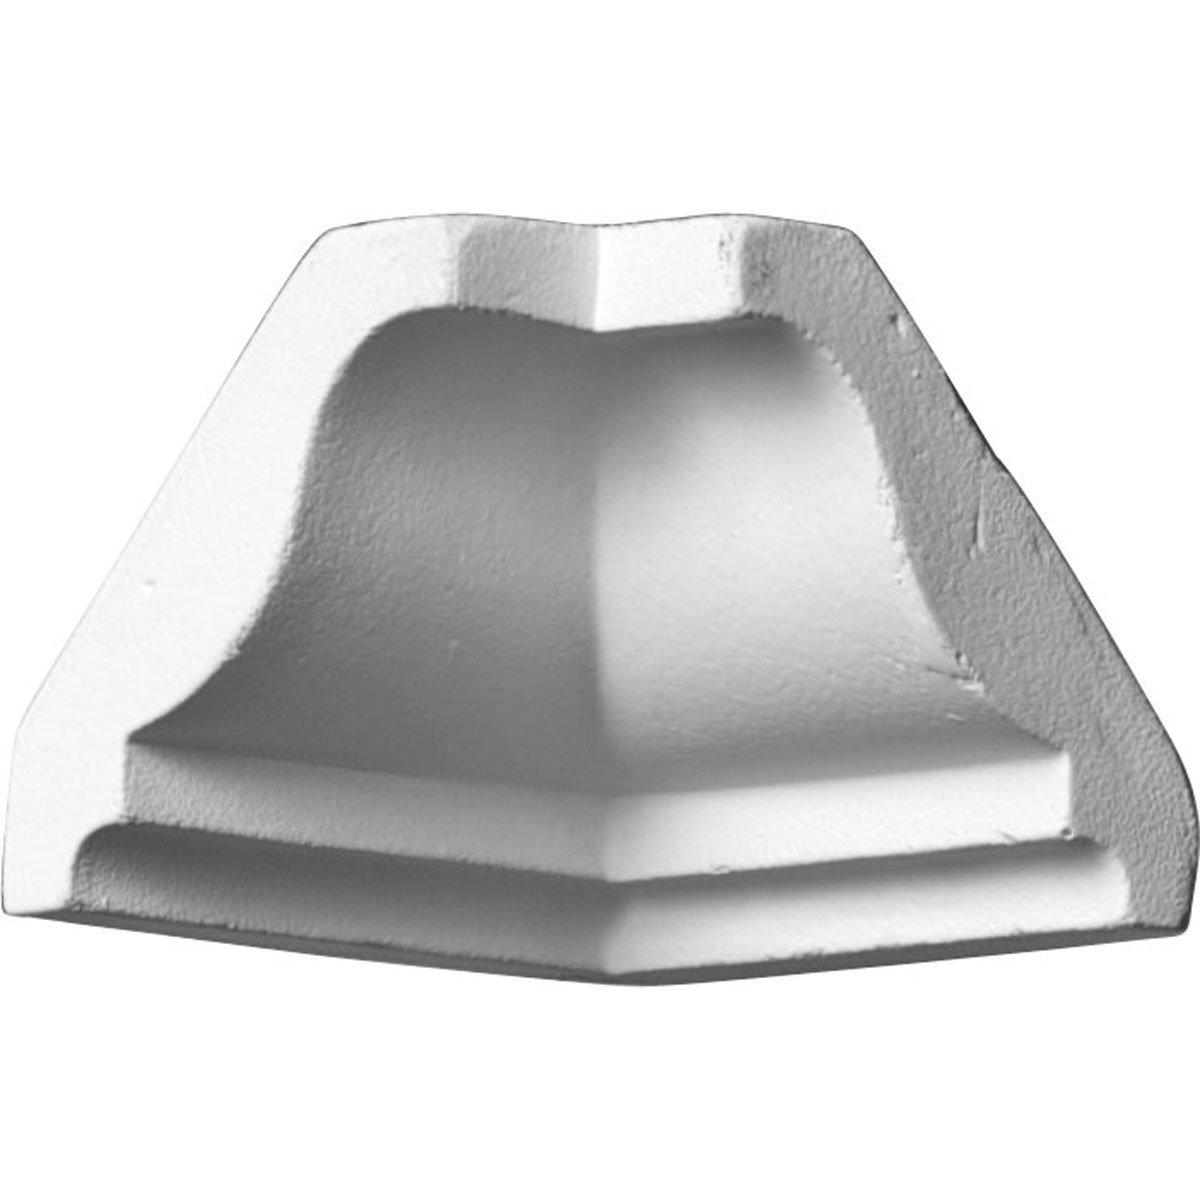 Ekena Millwork MIC01X01OD-CASE-4 1-5/8'' P x 1-5/8'' H Inside Corner for Molding MLD01X01X02OD (4-Pack)